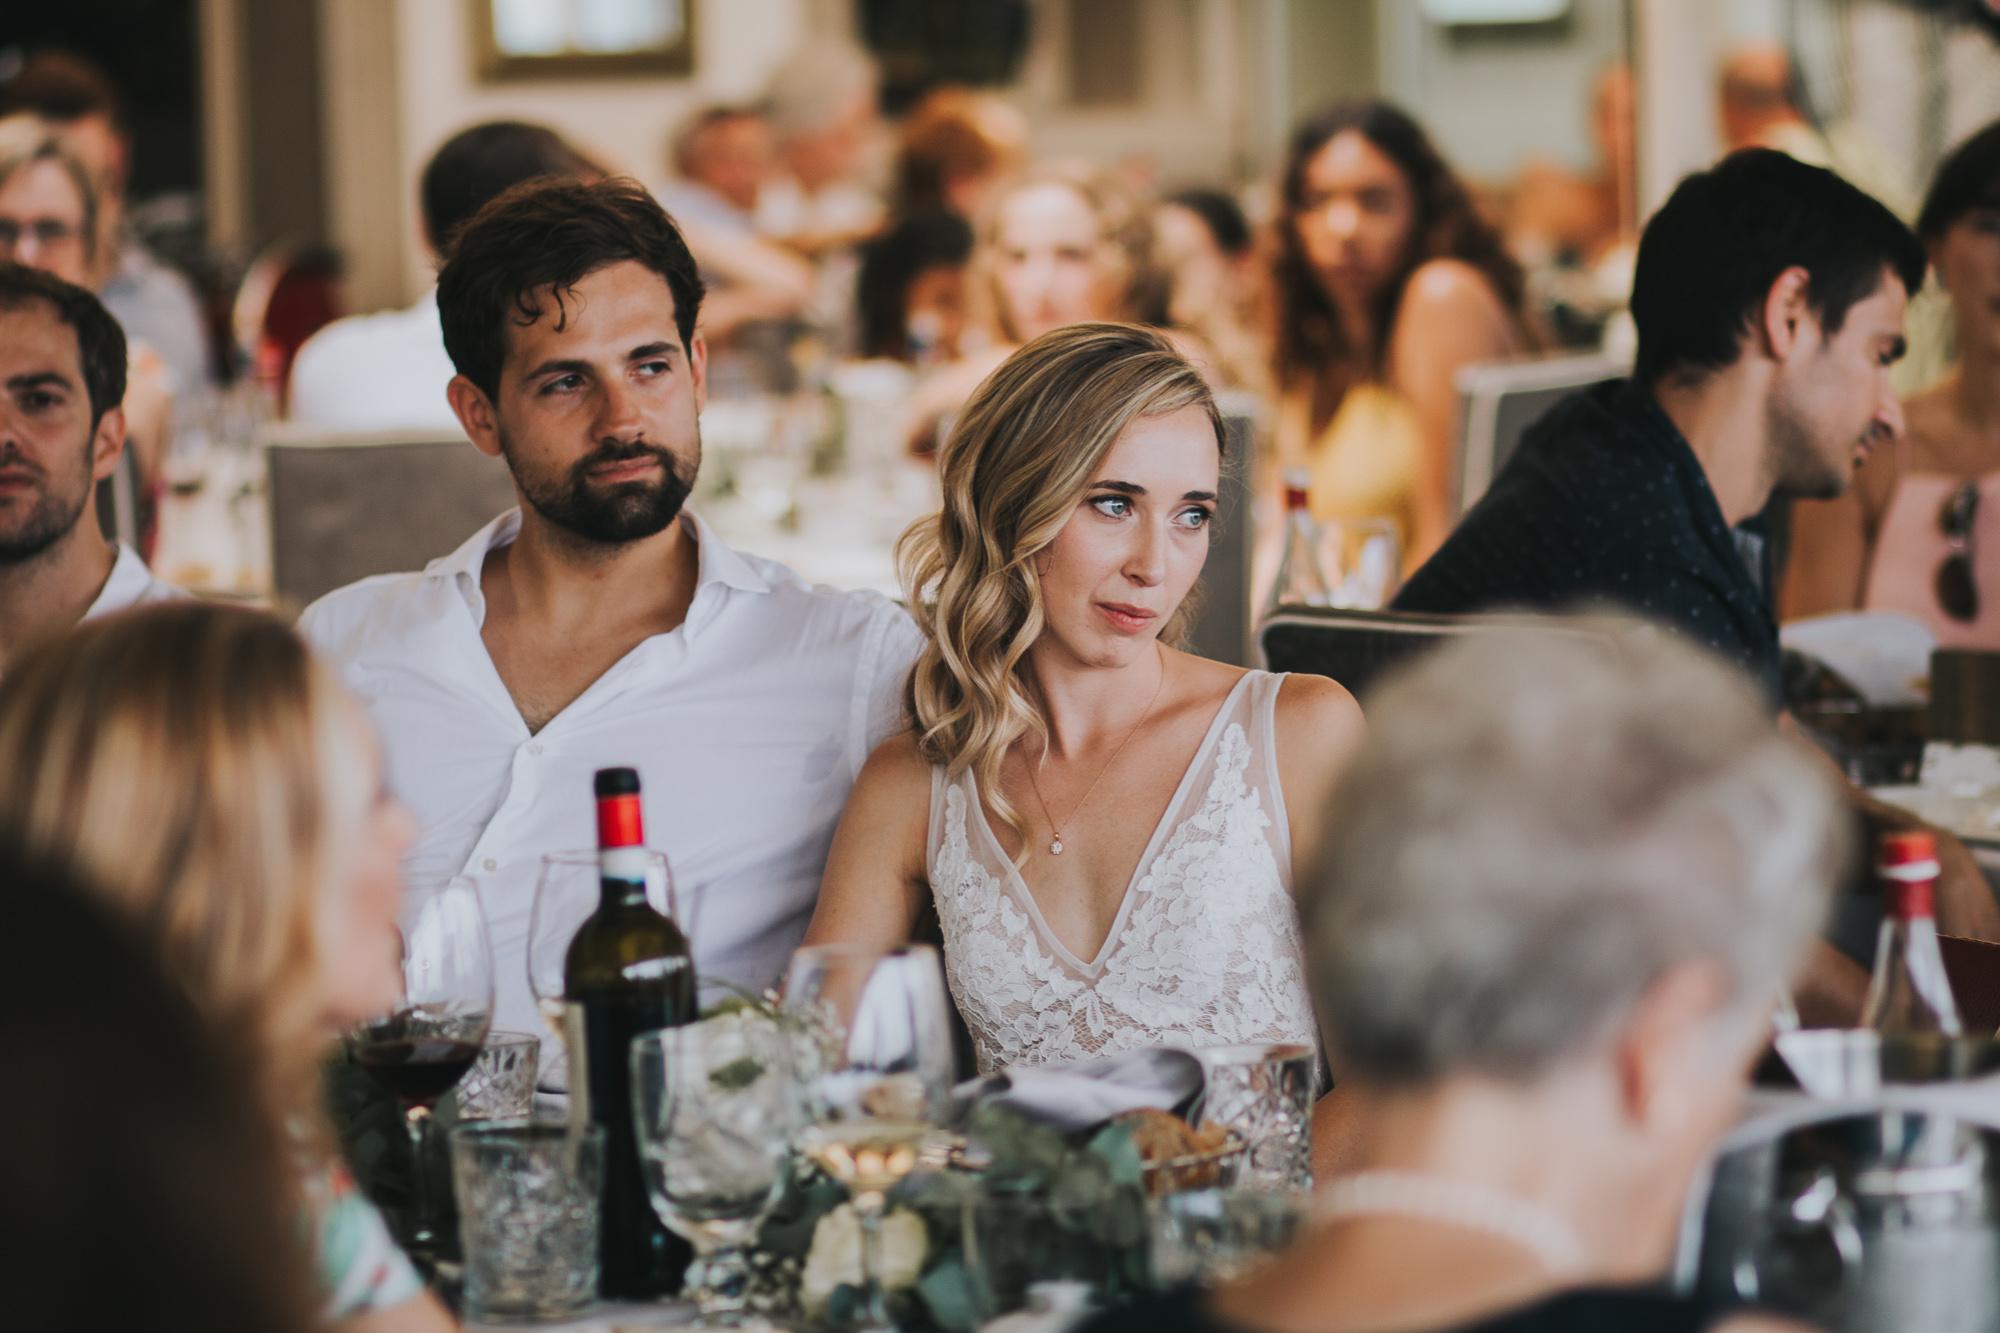 20180720-Memoryfactory-Sara&Jacopo-79- Hochzeit.jpg